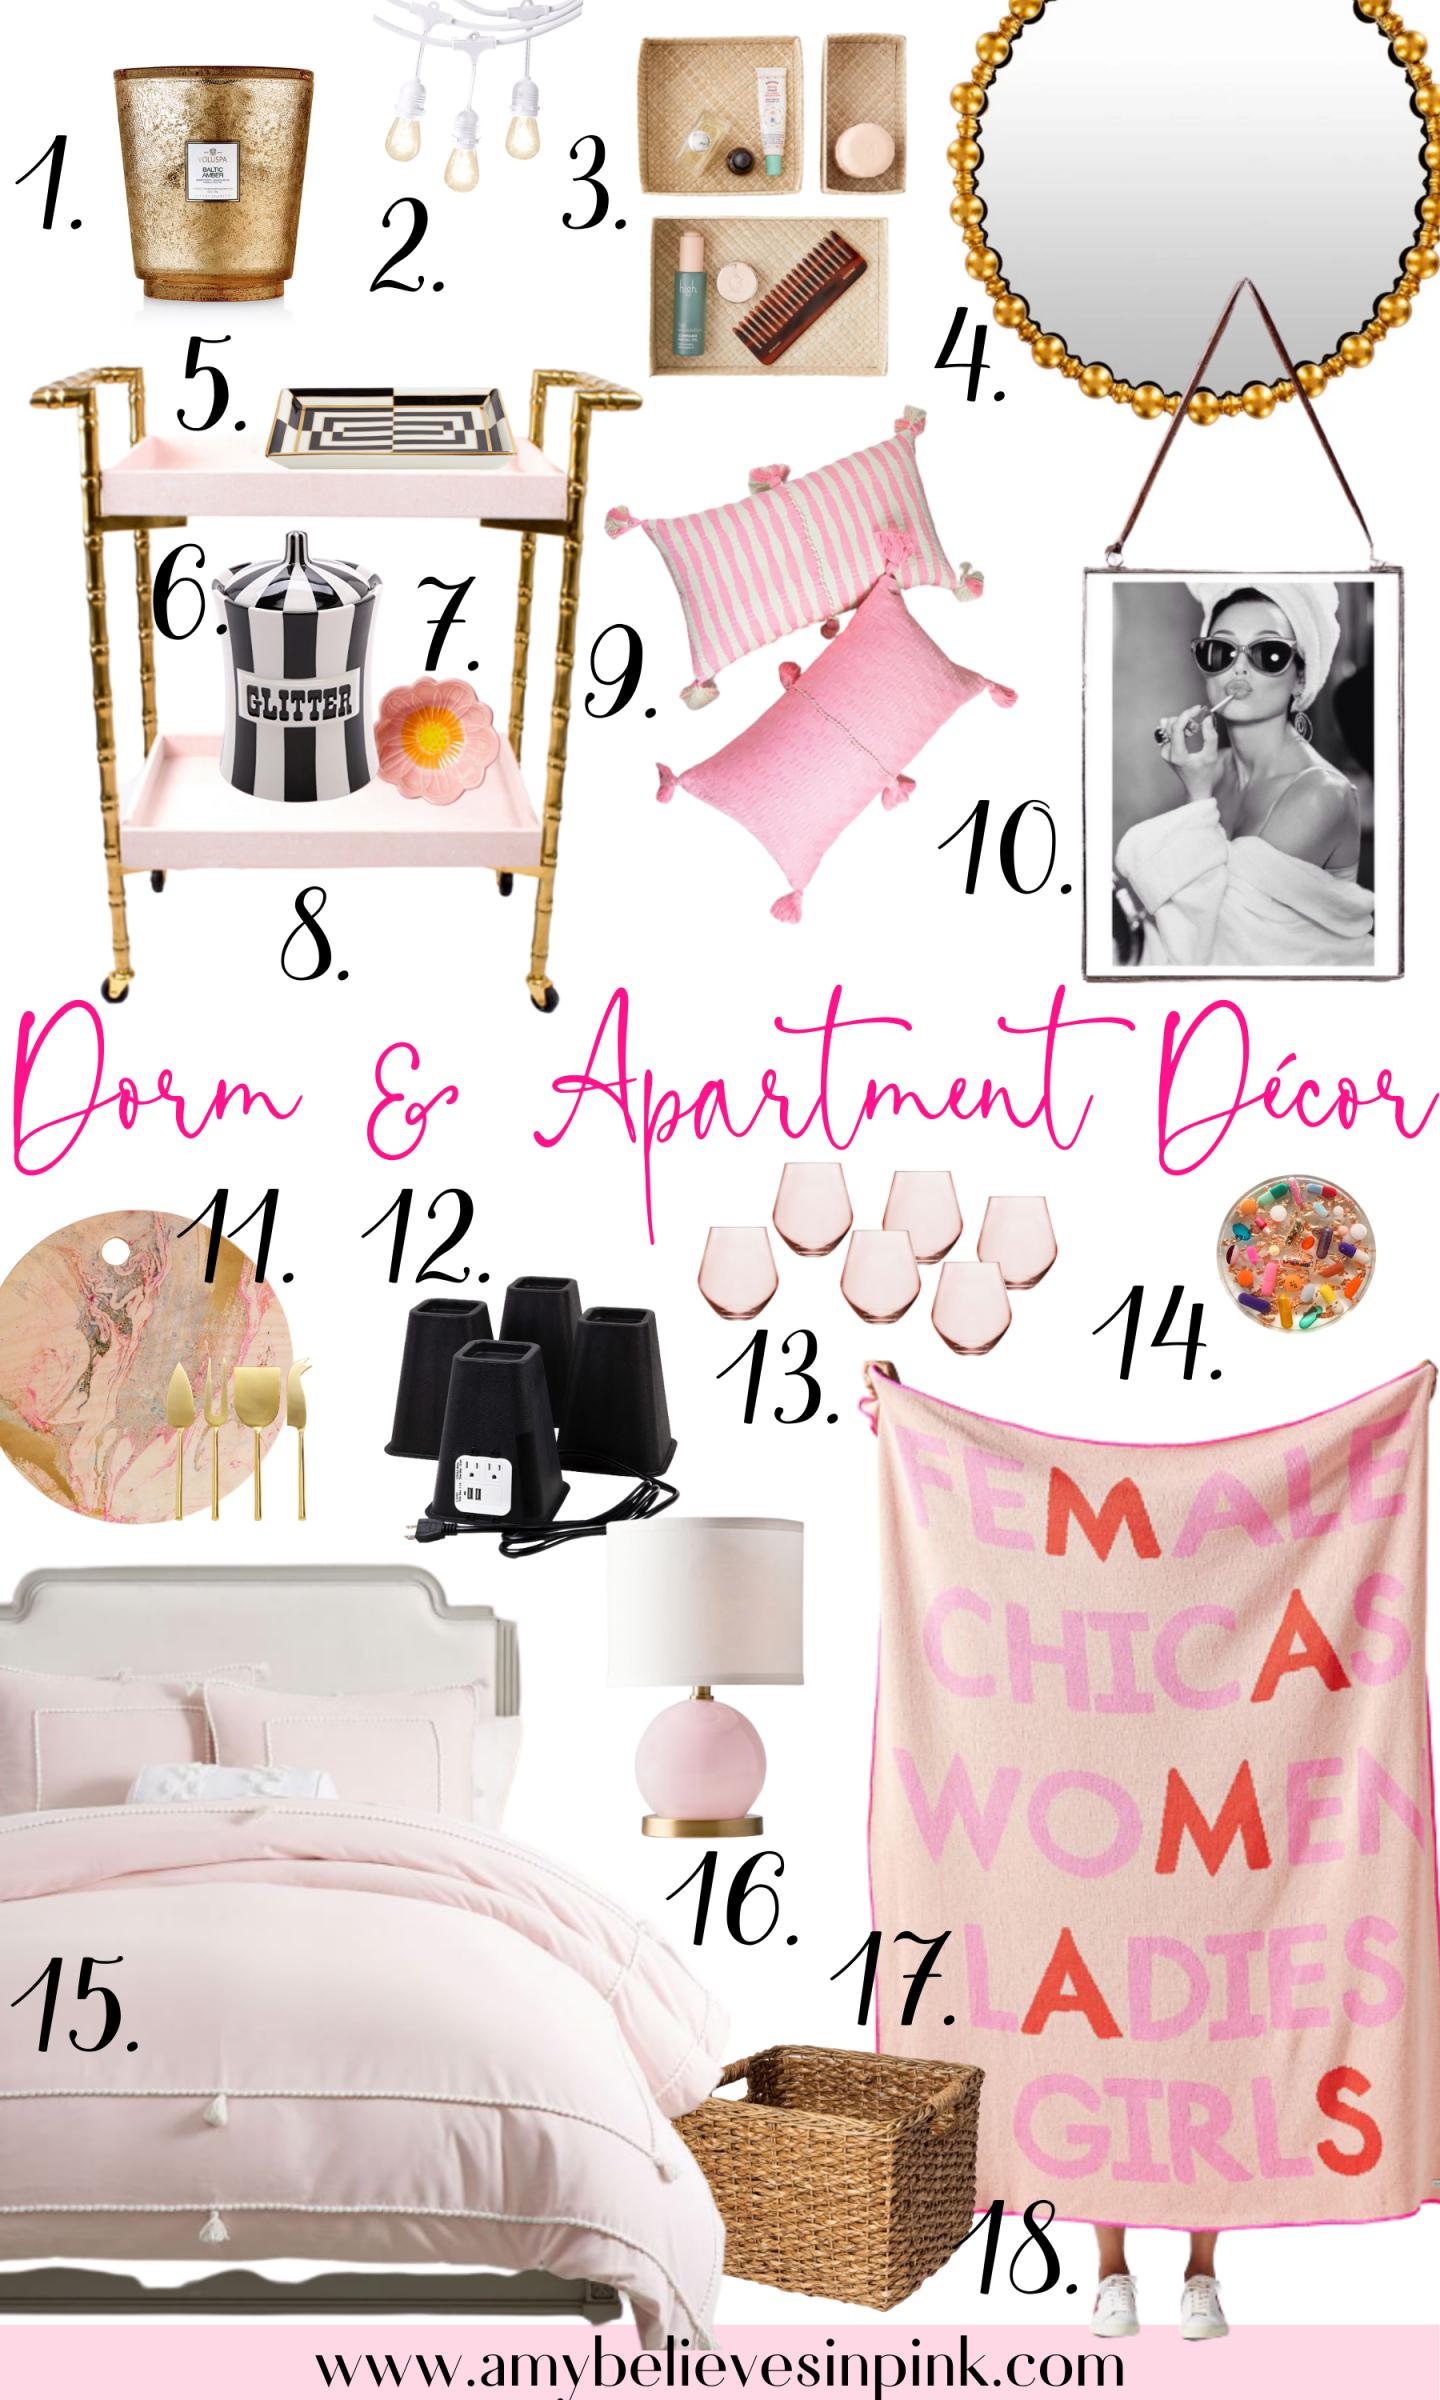 Dorm and apartment décor tips